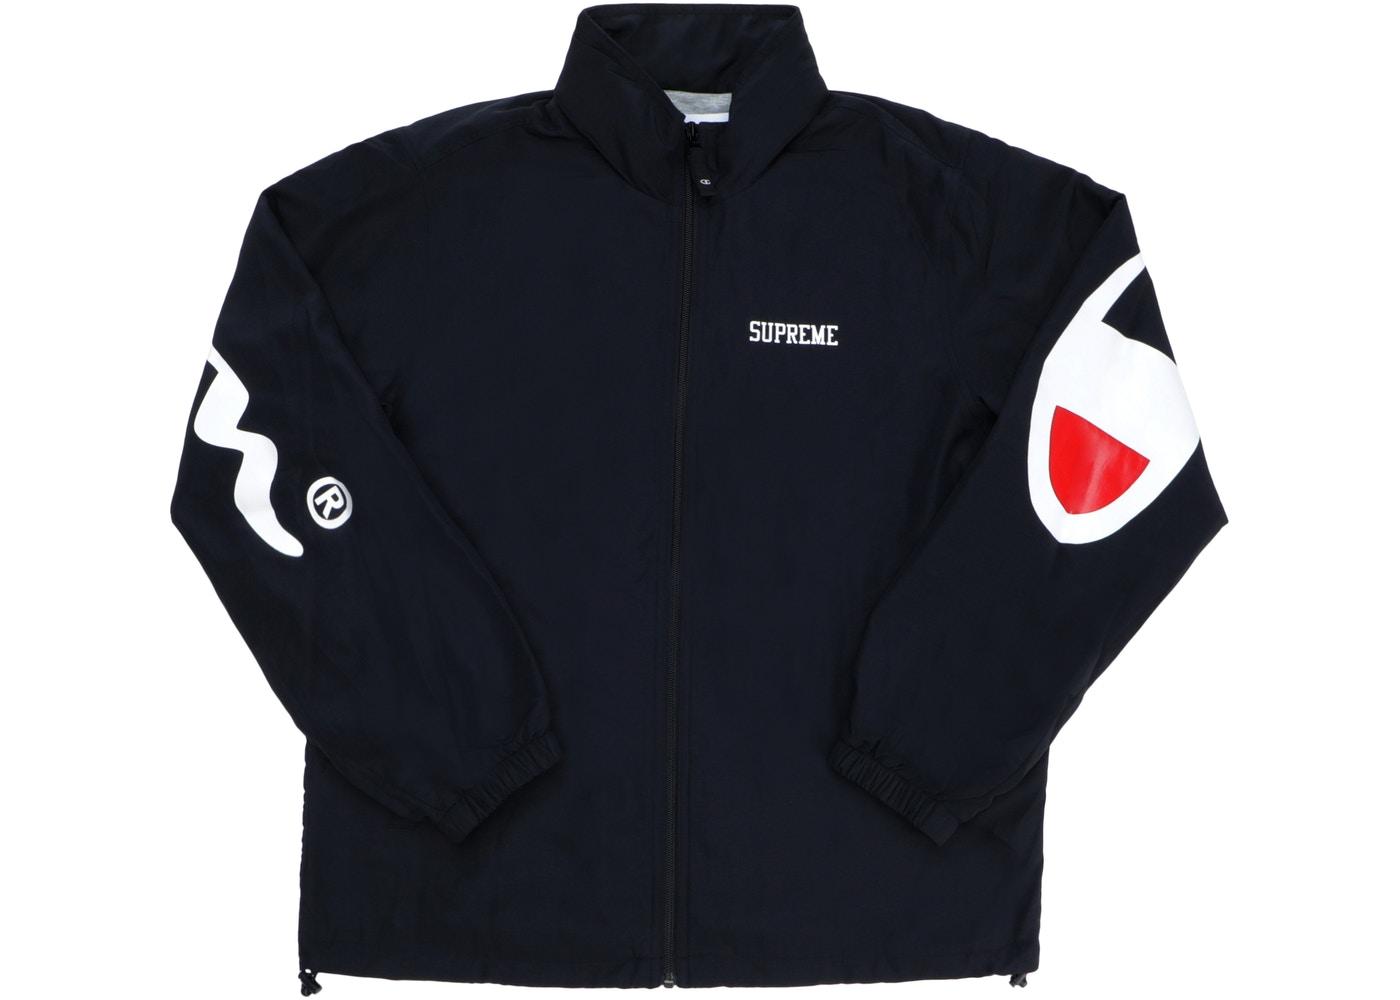 2a9afa04b9b9e Supreme × Champion ×. Supreme x Champion Track Jacket Black